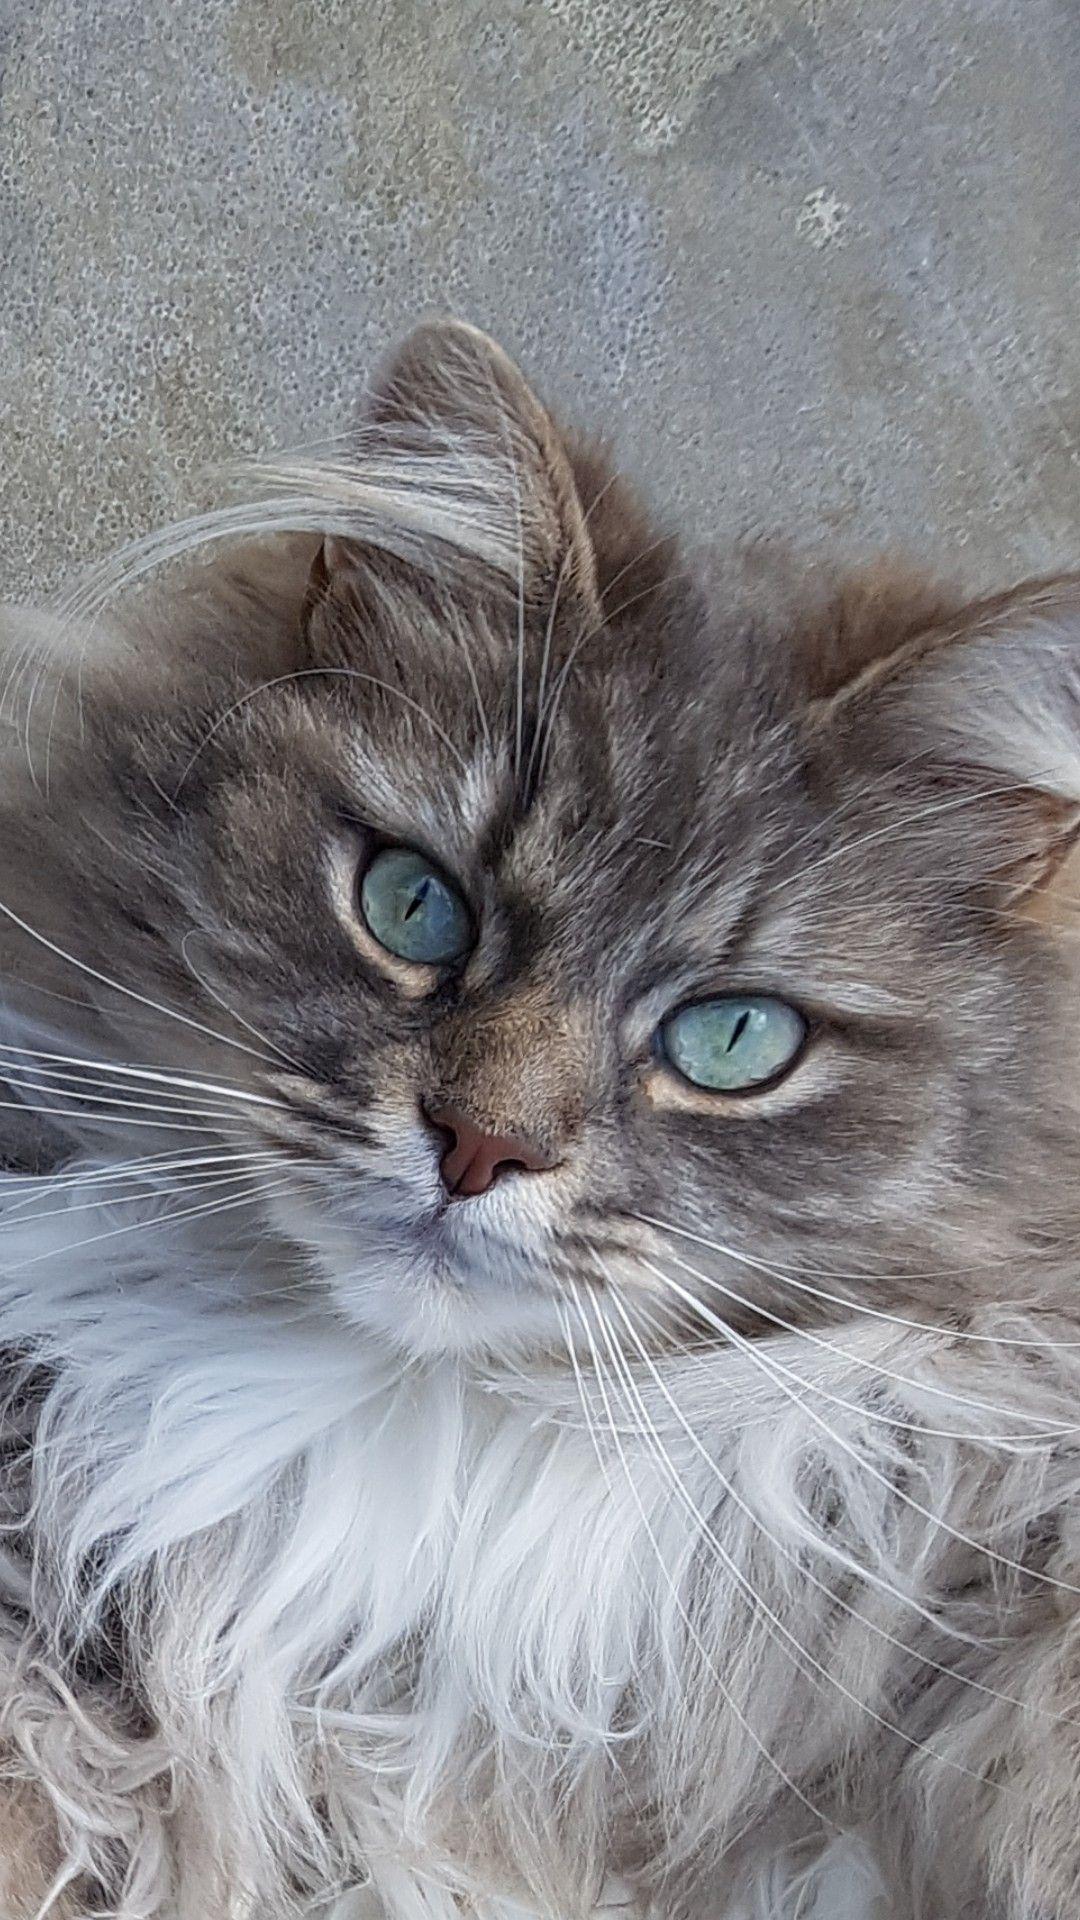 Gatos & Cats 😻 (gato_cats) Instagram Posts, Videos